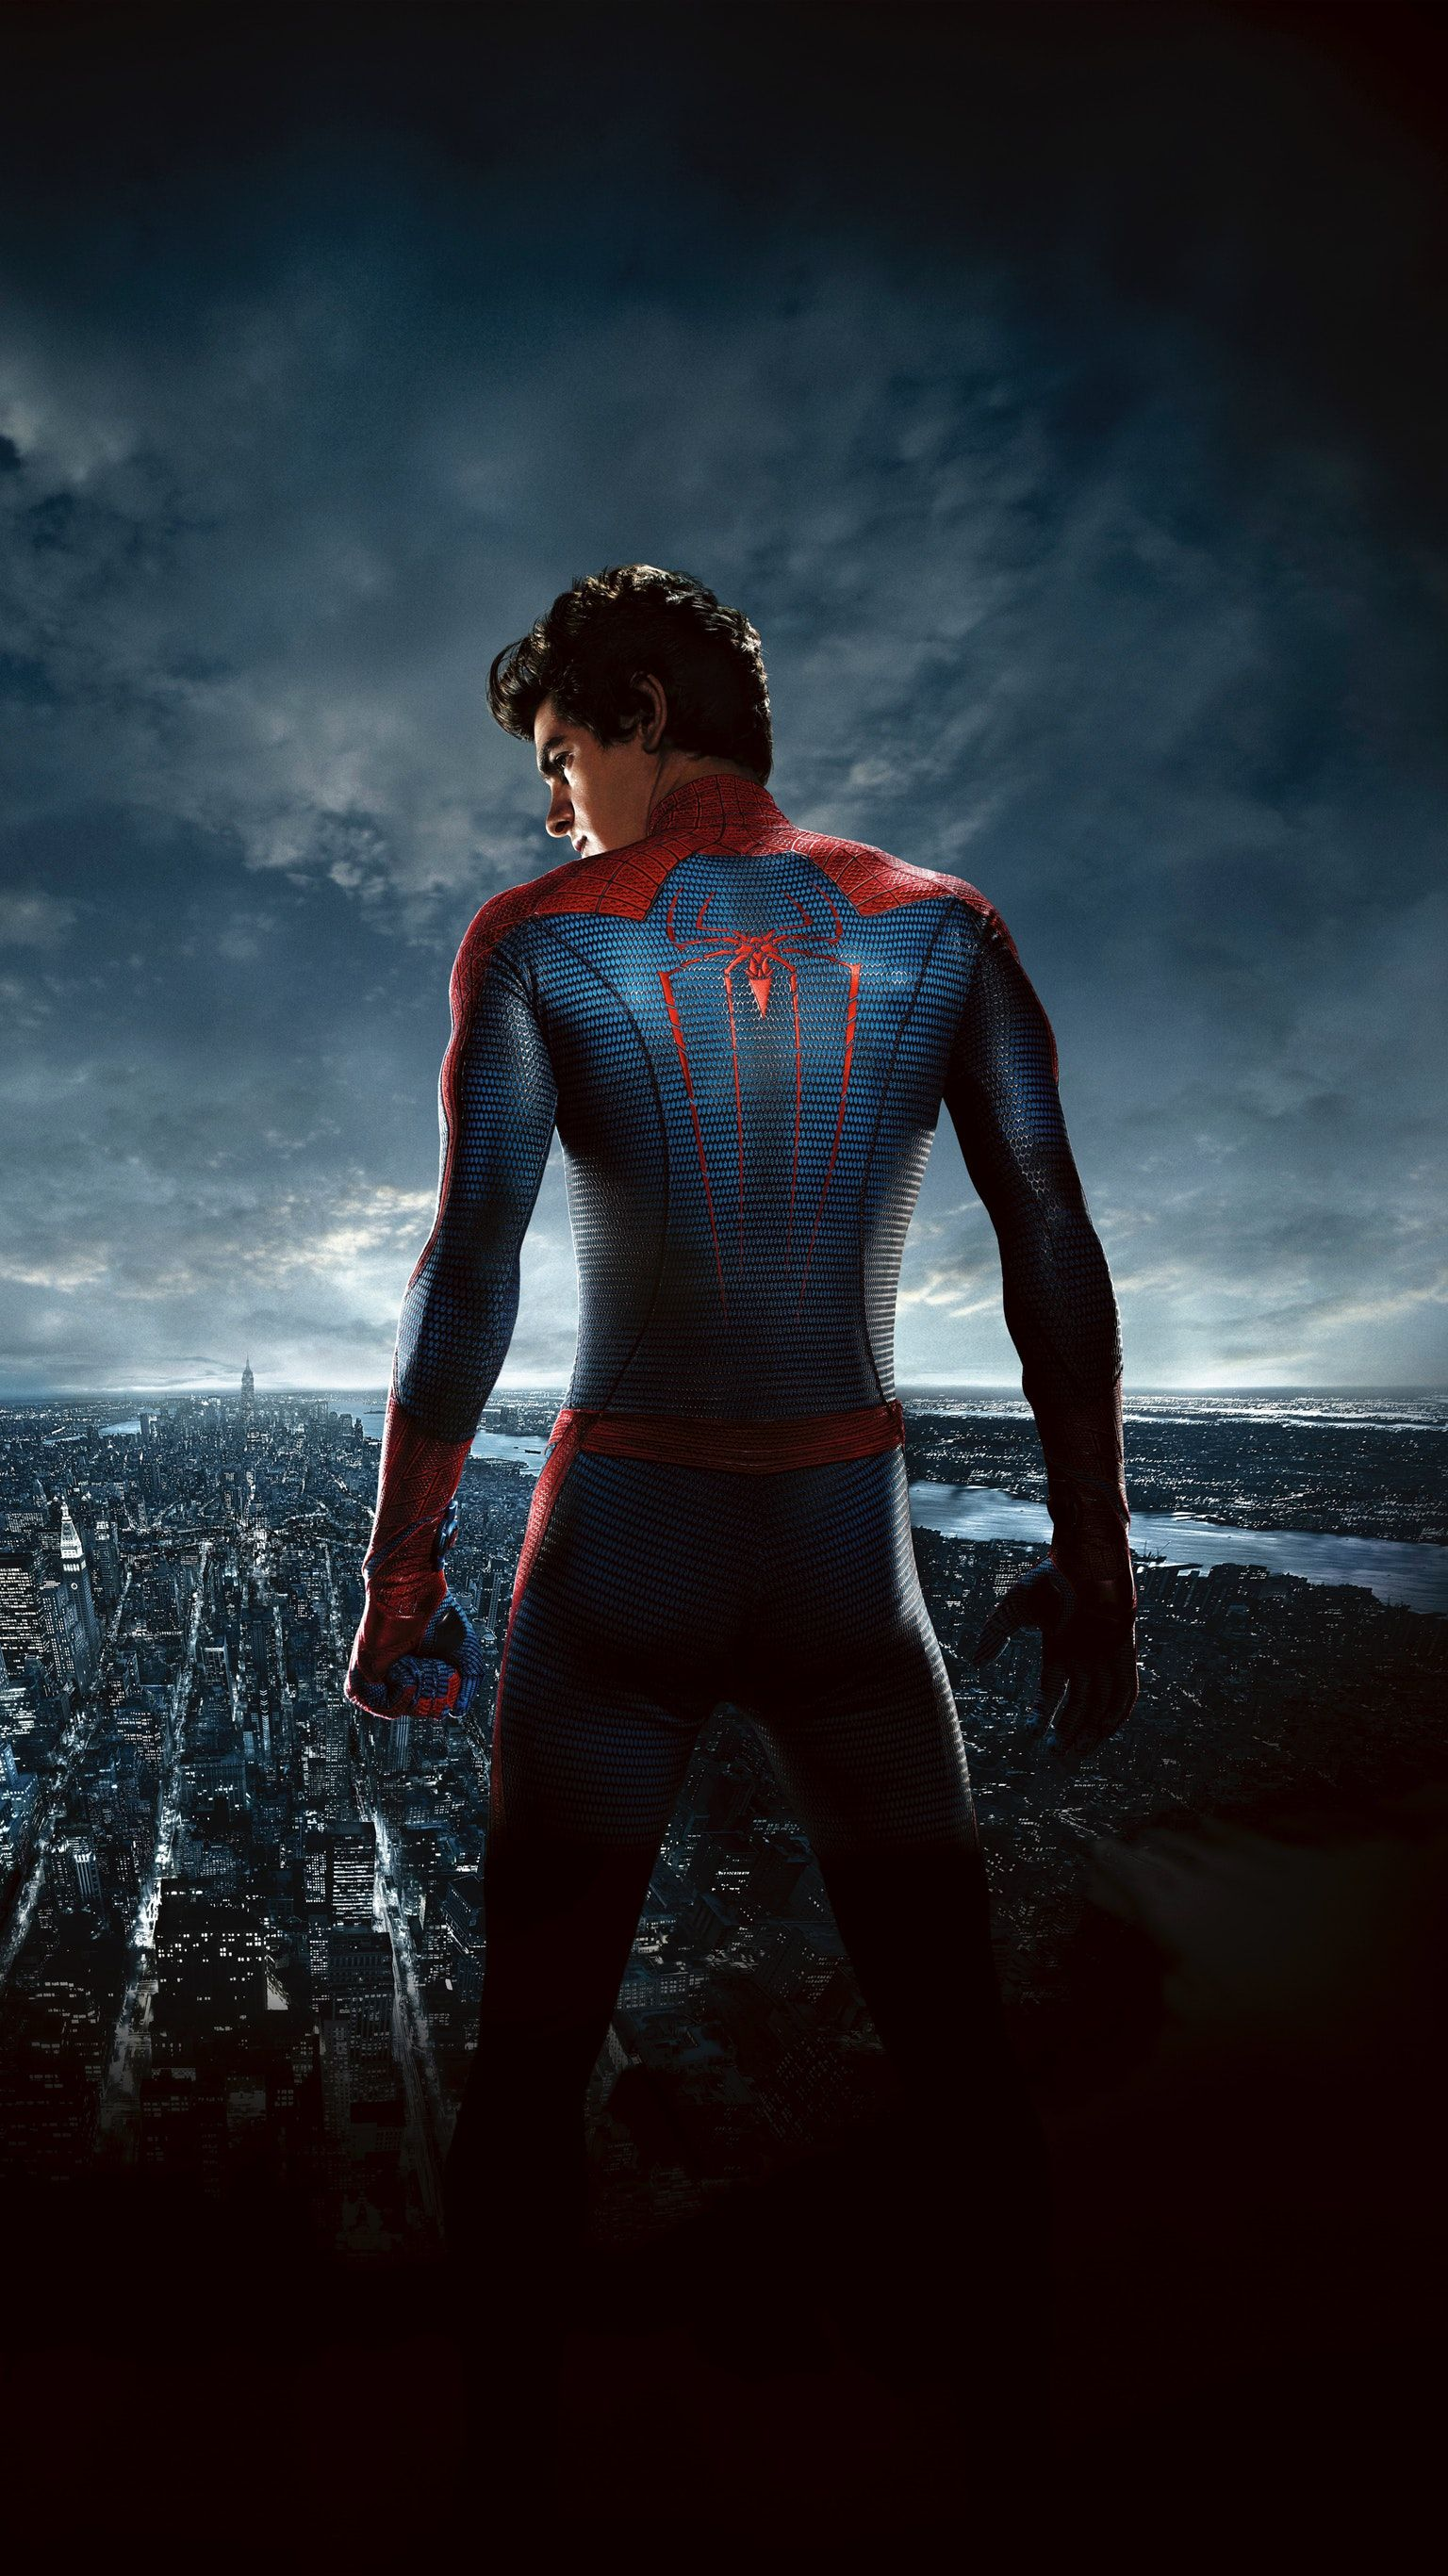 The Amazing Spider Man 2012 Phone Wallpaper Lunivers Du Cinéma